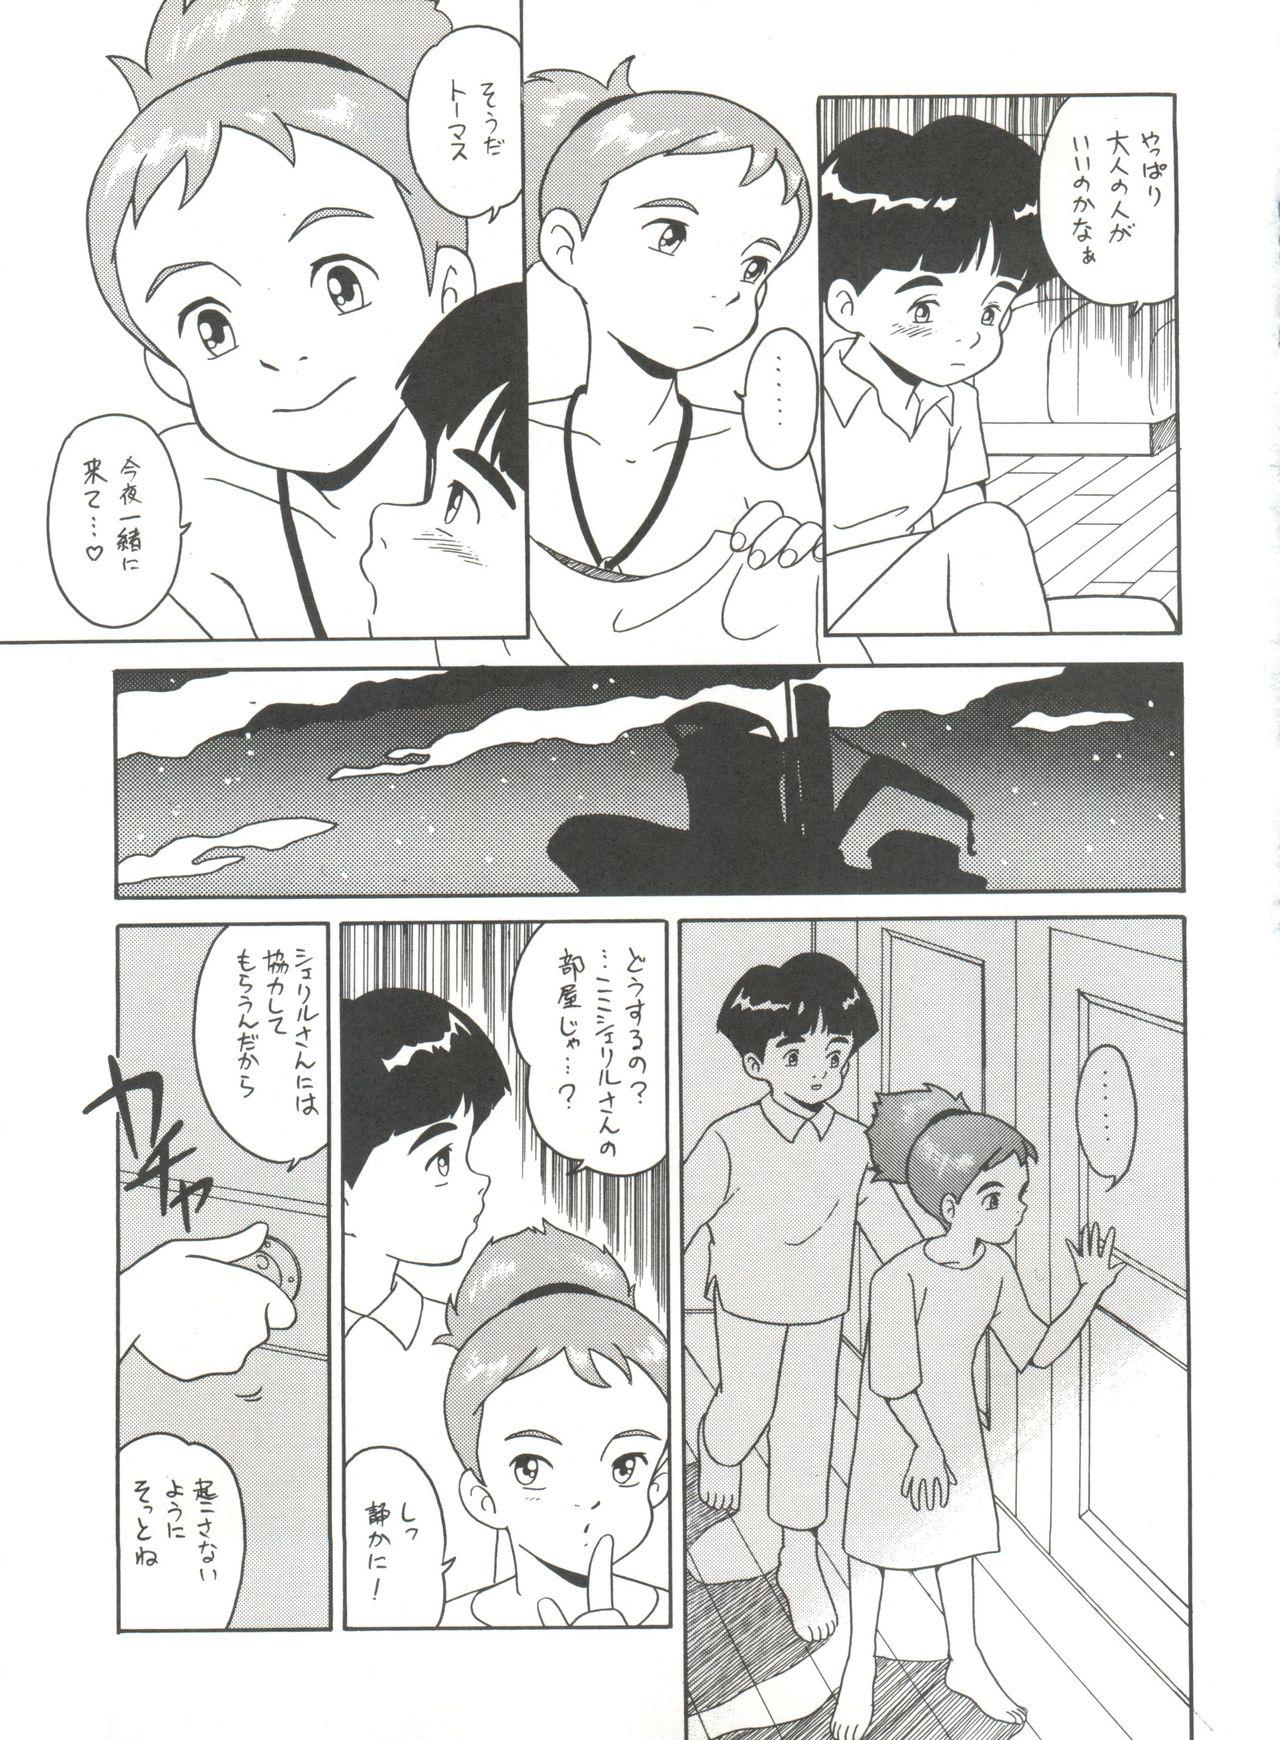 Hara Hara Dokei Vol. 4 Quattro 79